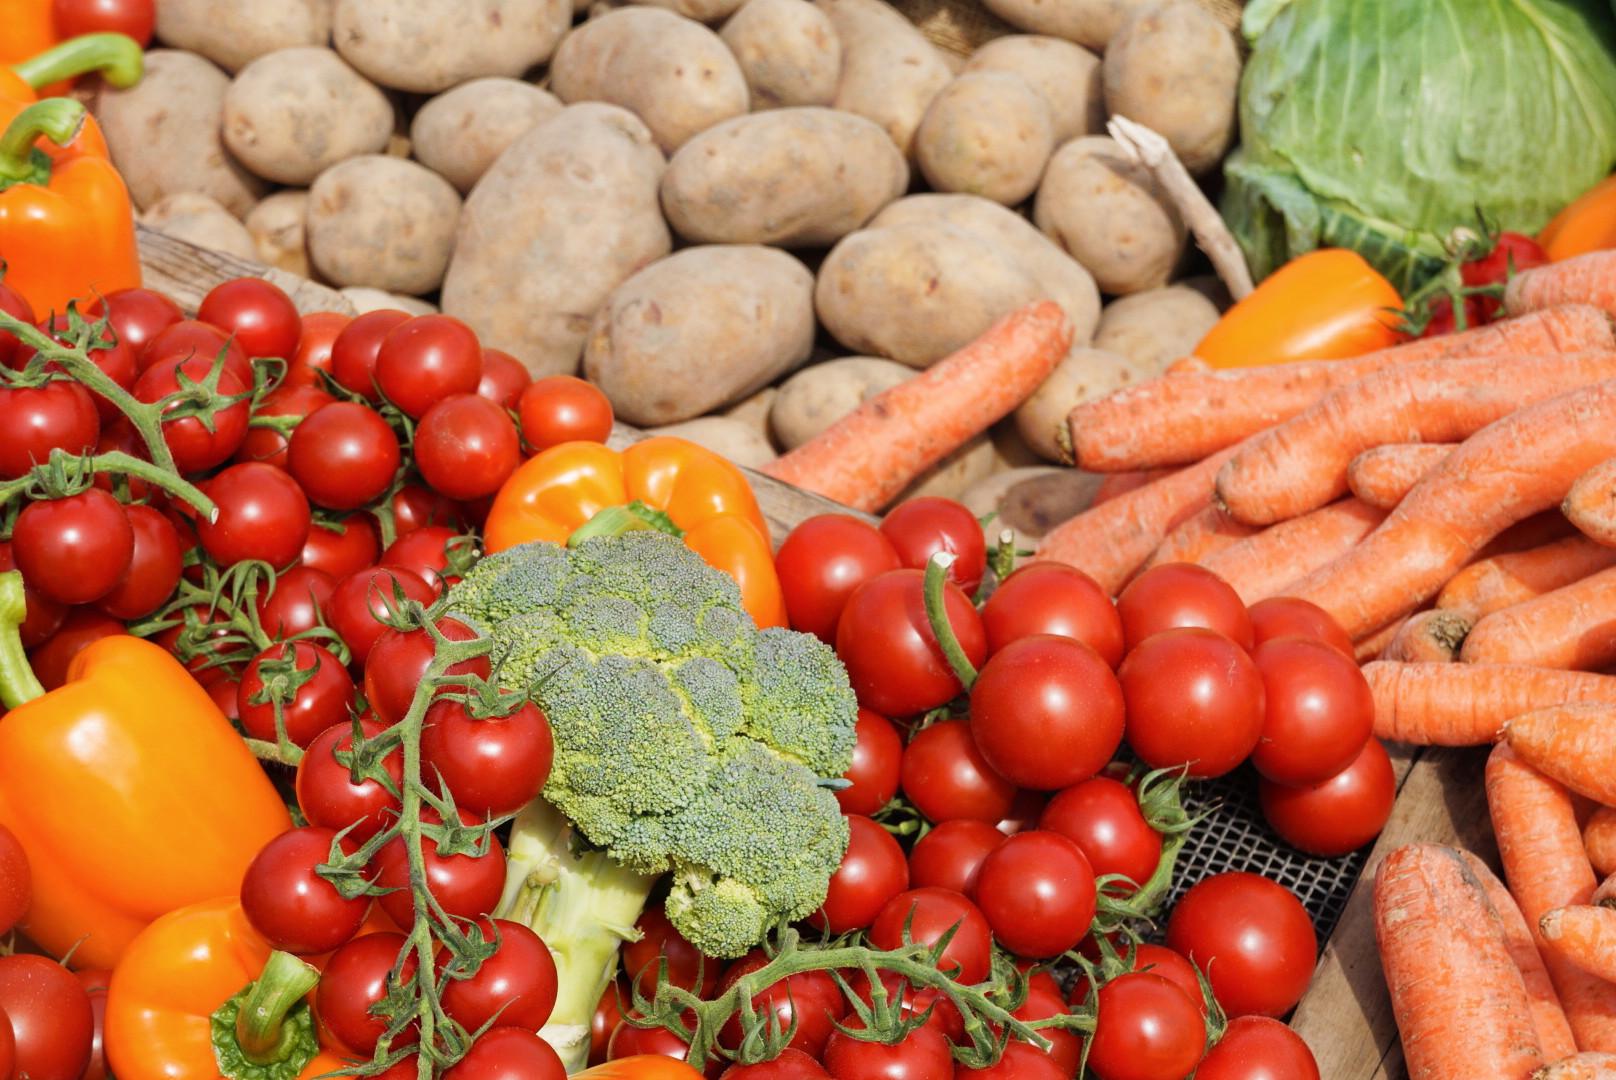 veggies.jpg - 537.20 kB